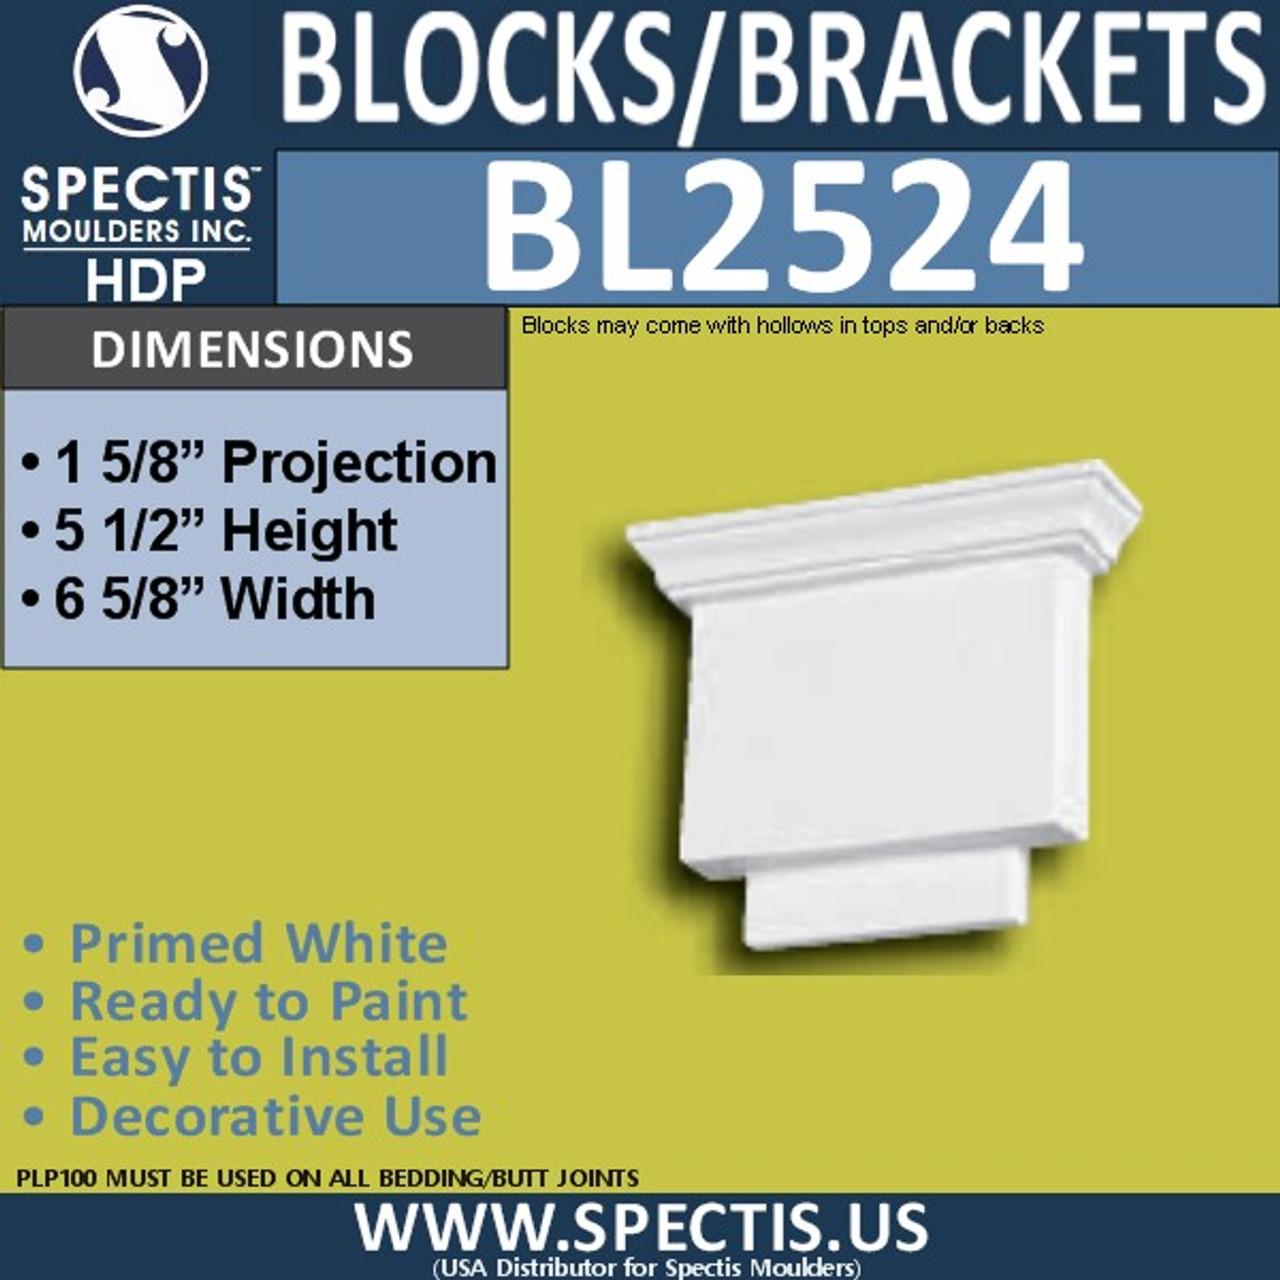 "BL2524 Eave Block or Bracket 6.5""W x 5.5""H x 2"" P"